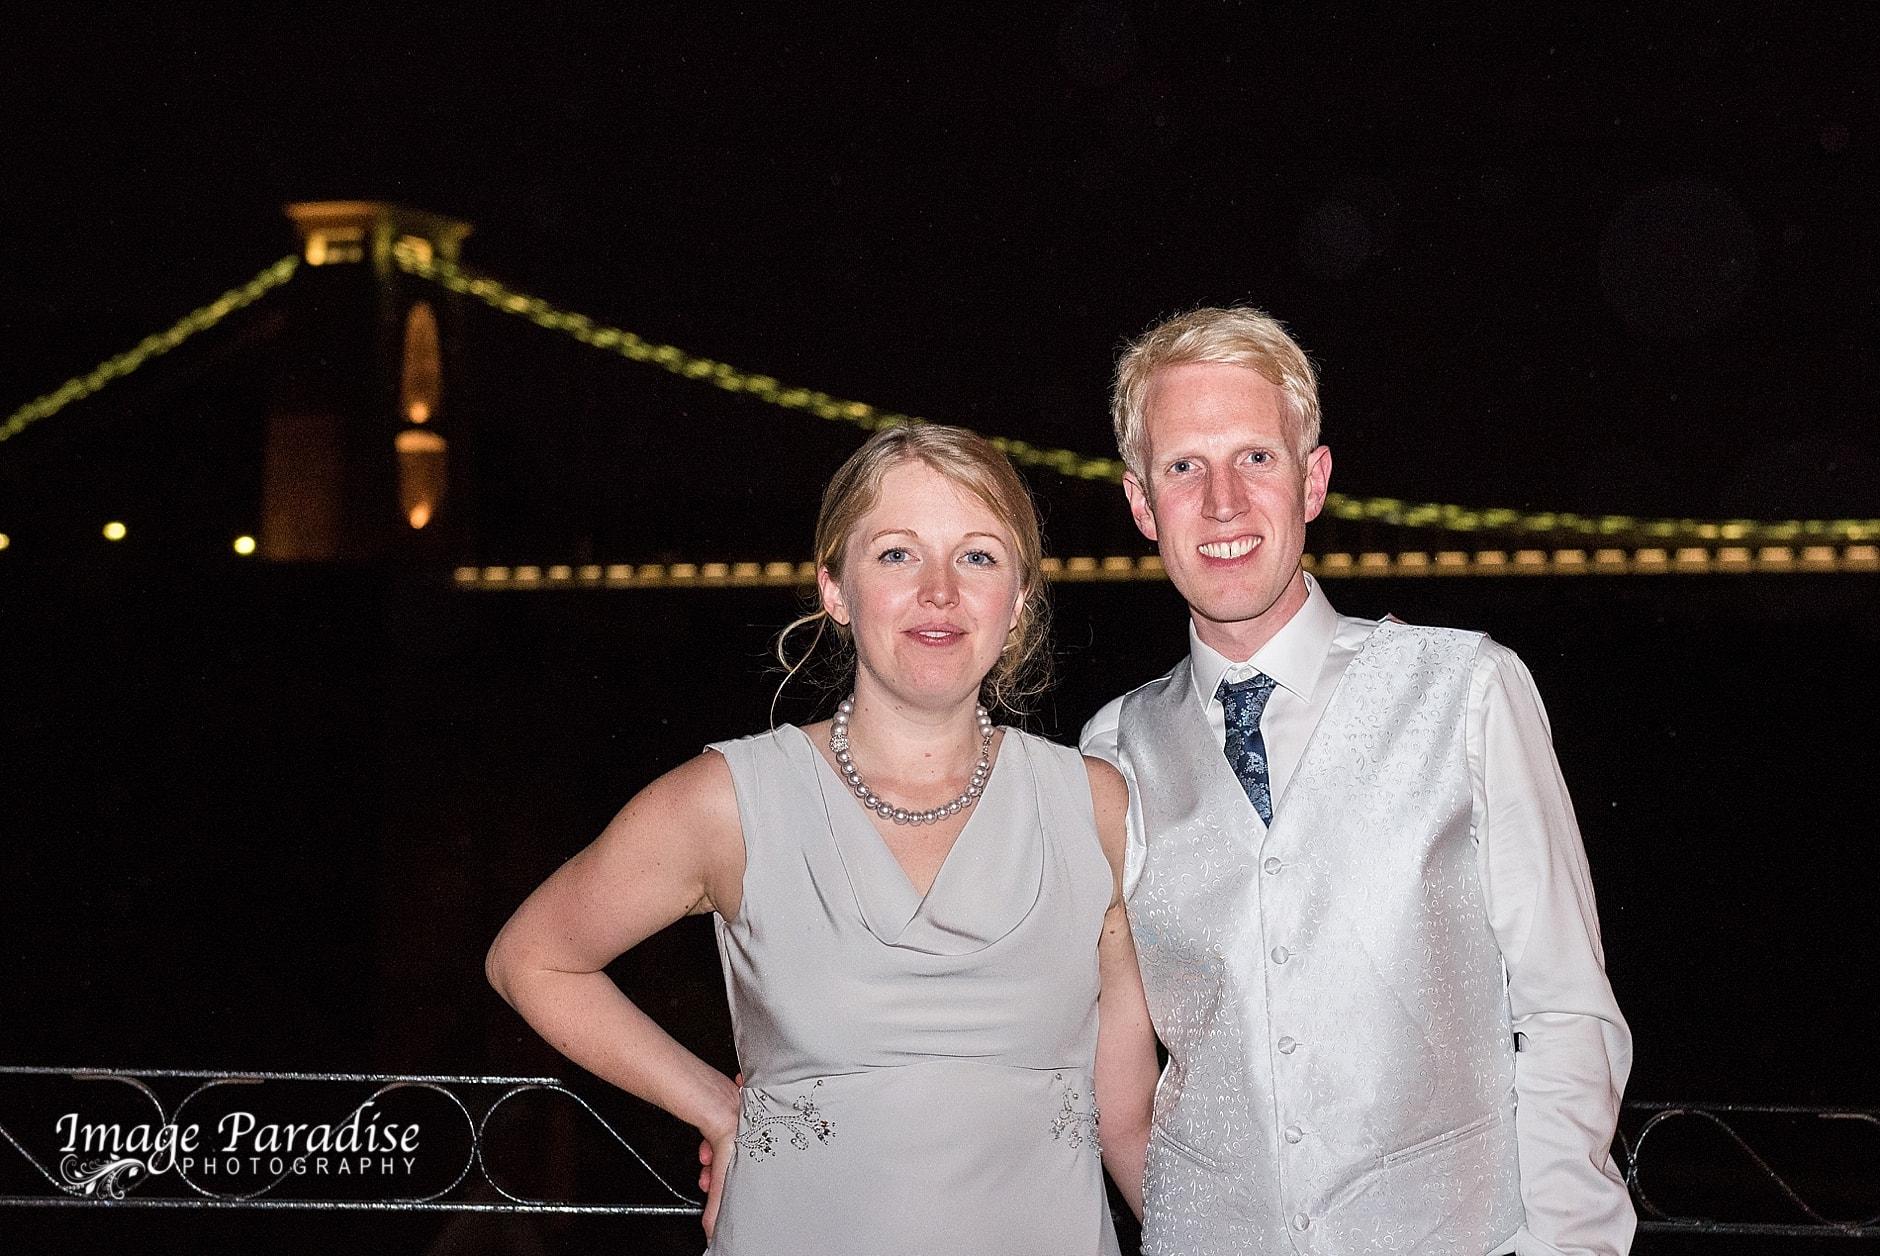 Night image of bride & groom next to the suspension bridge